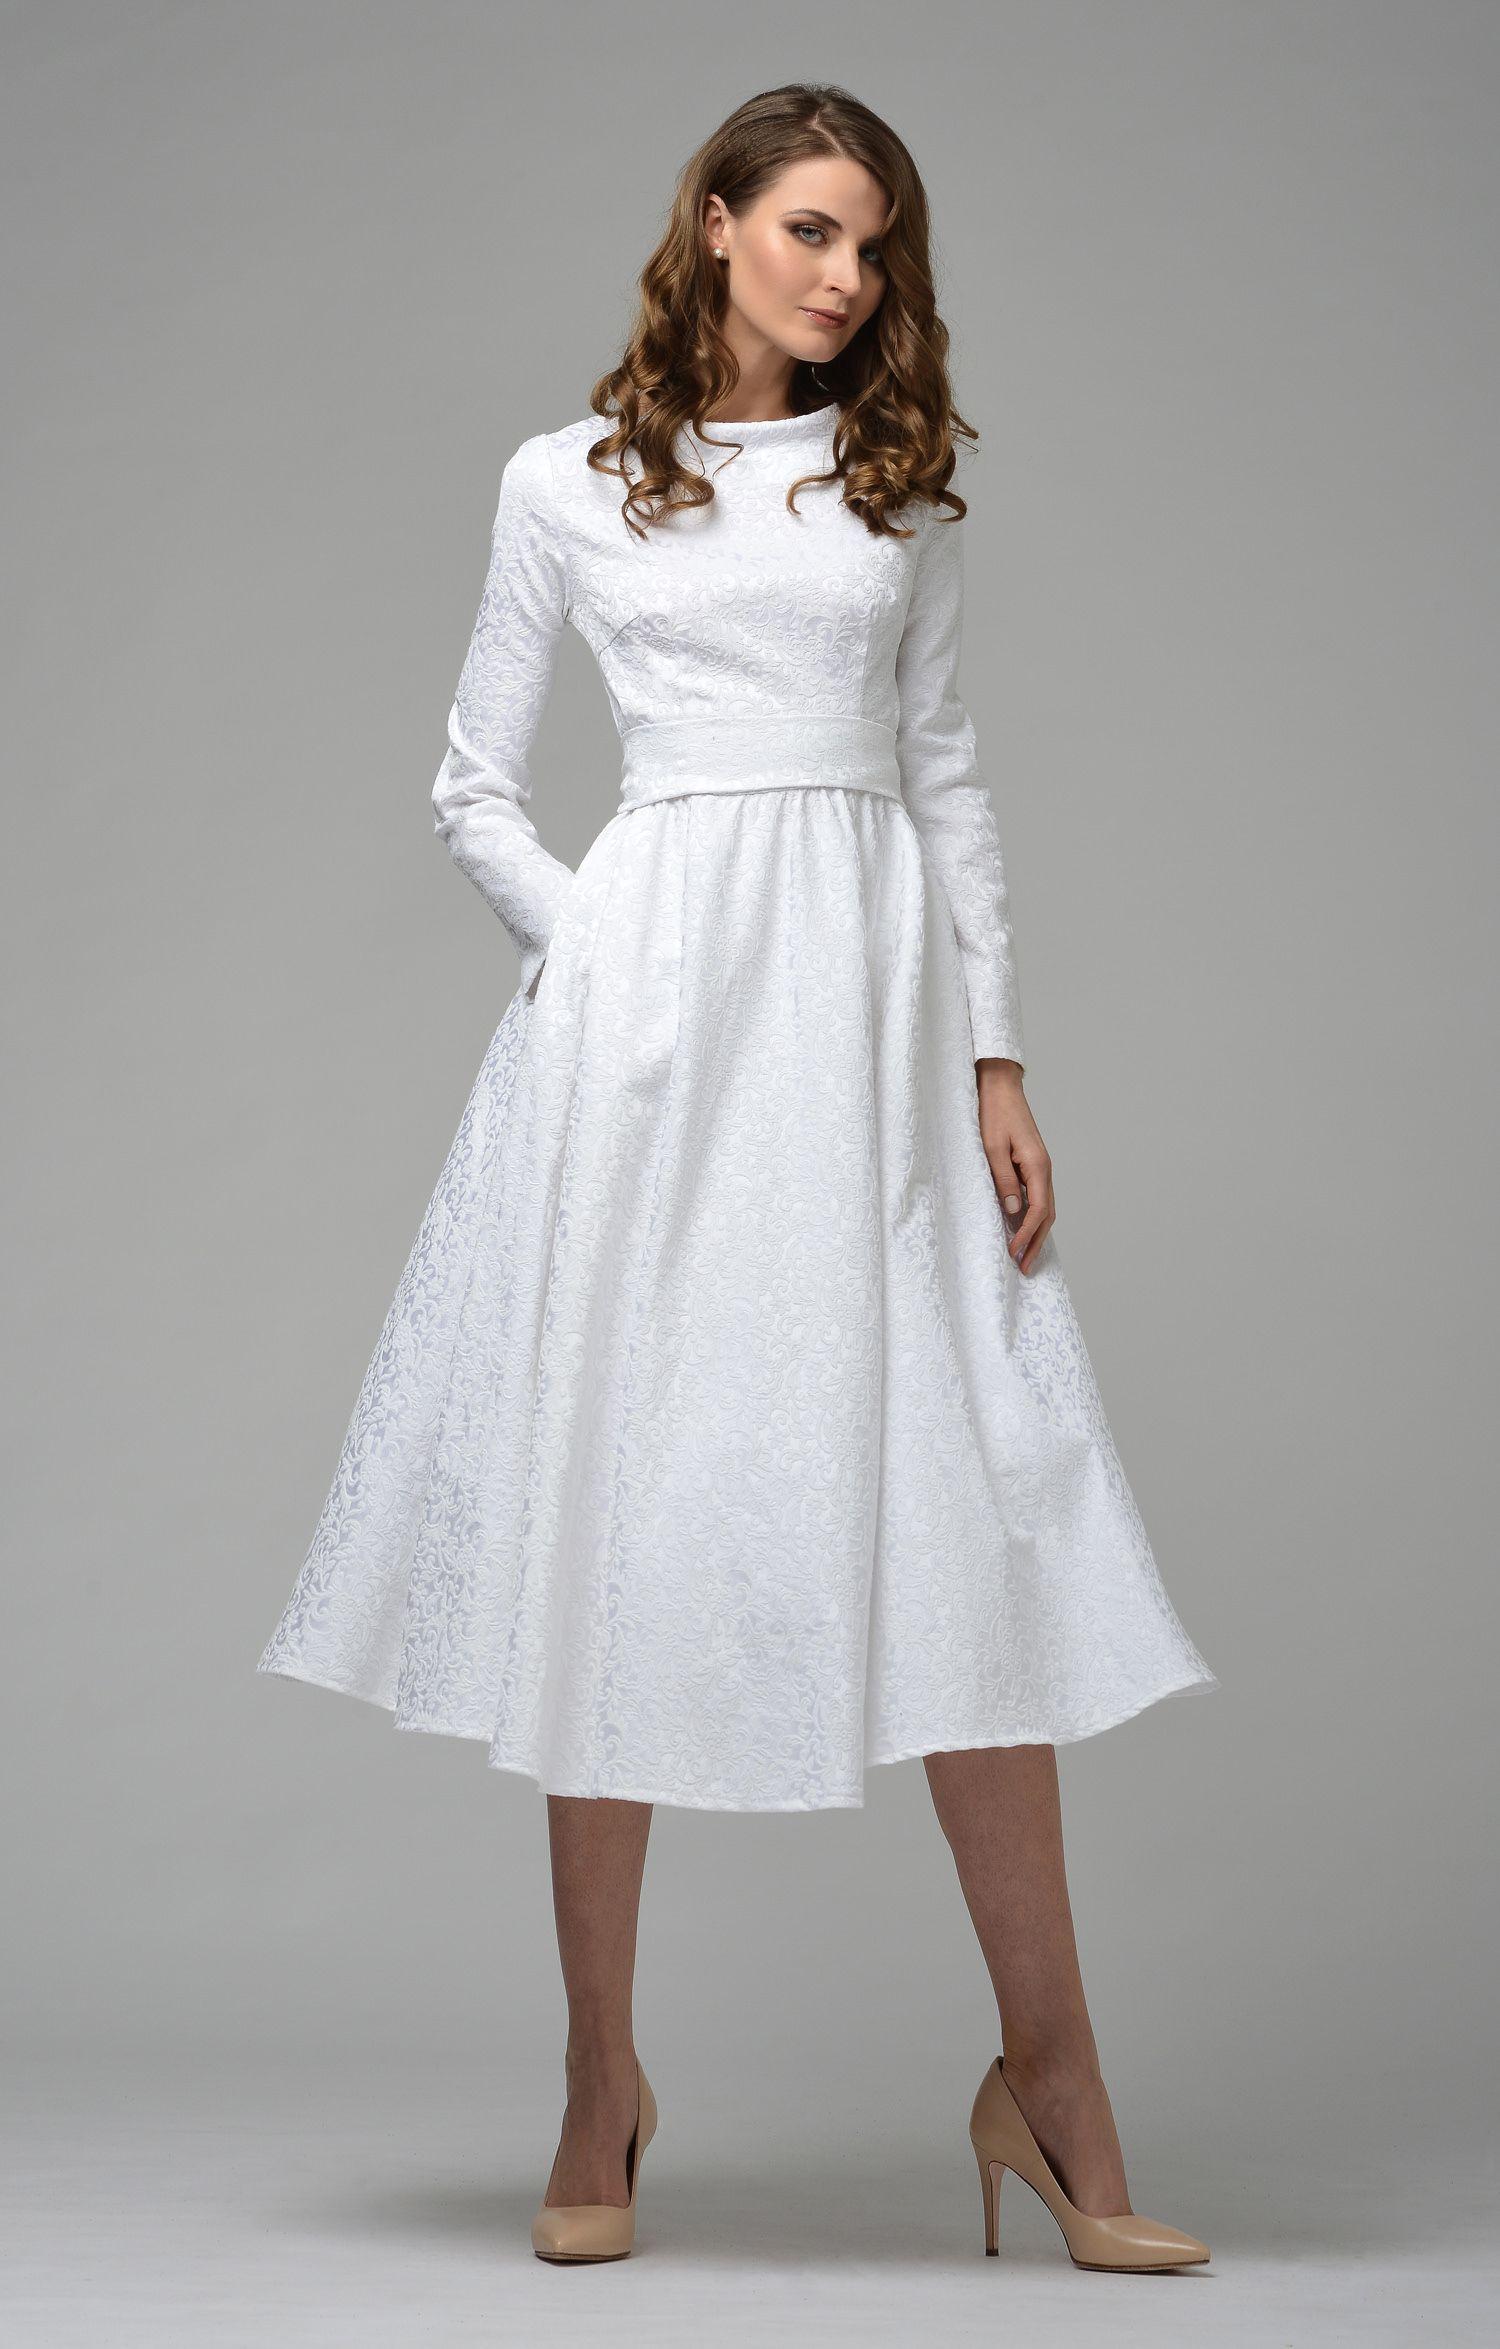 Designer Kleider  Fashion dresses, Fashion, Cream dress outfit